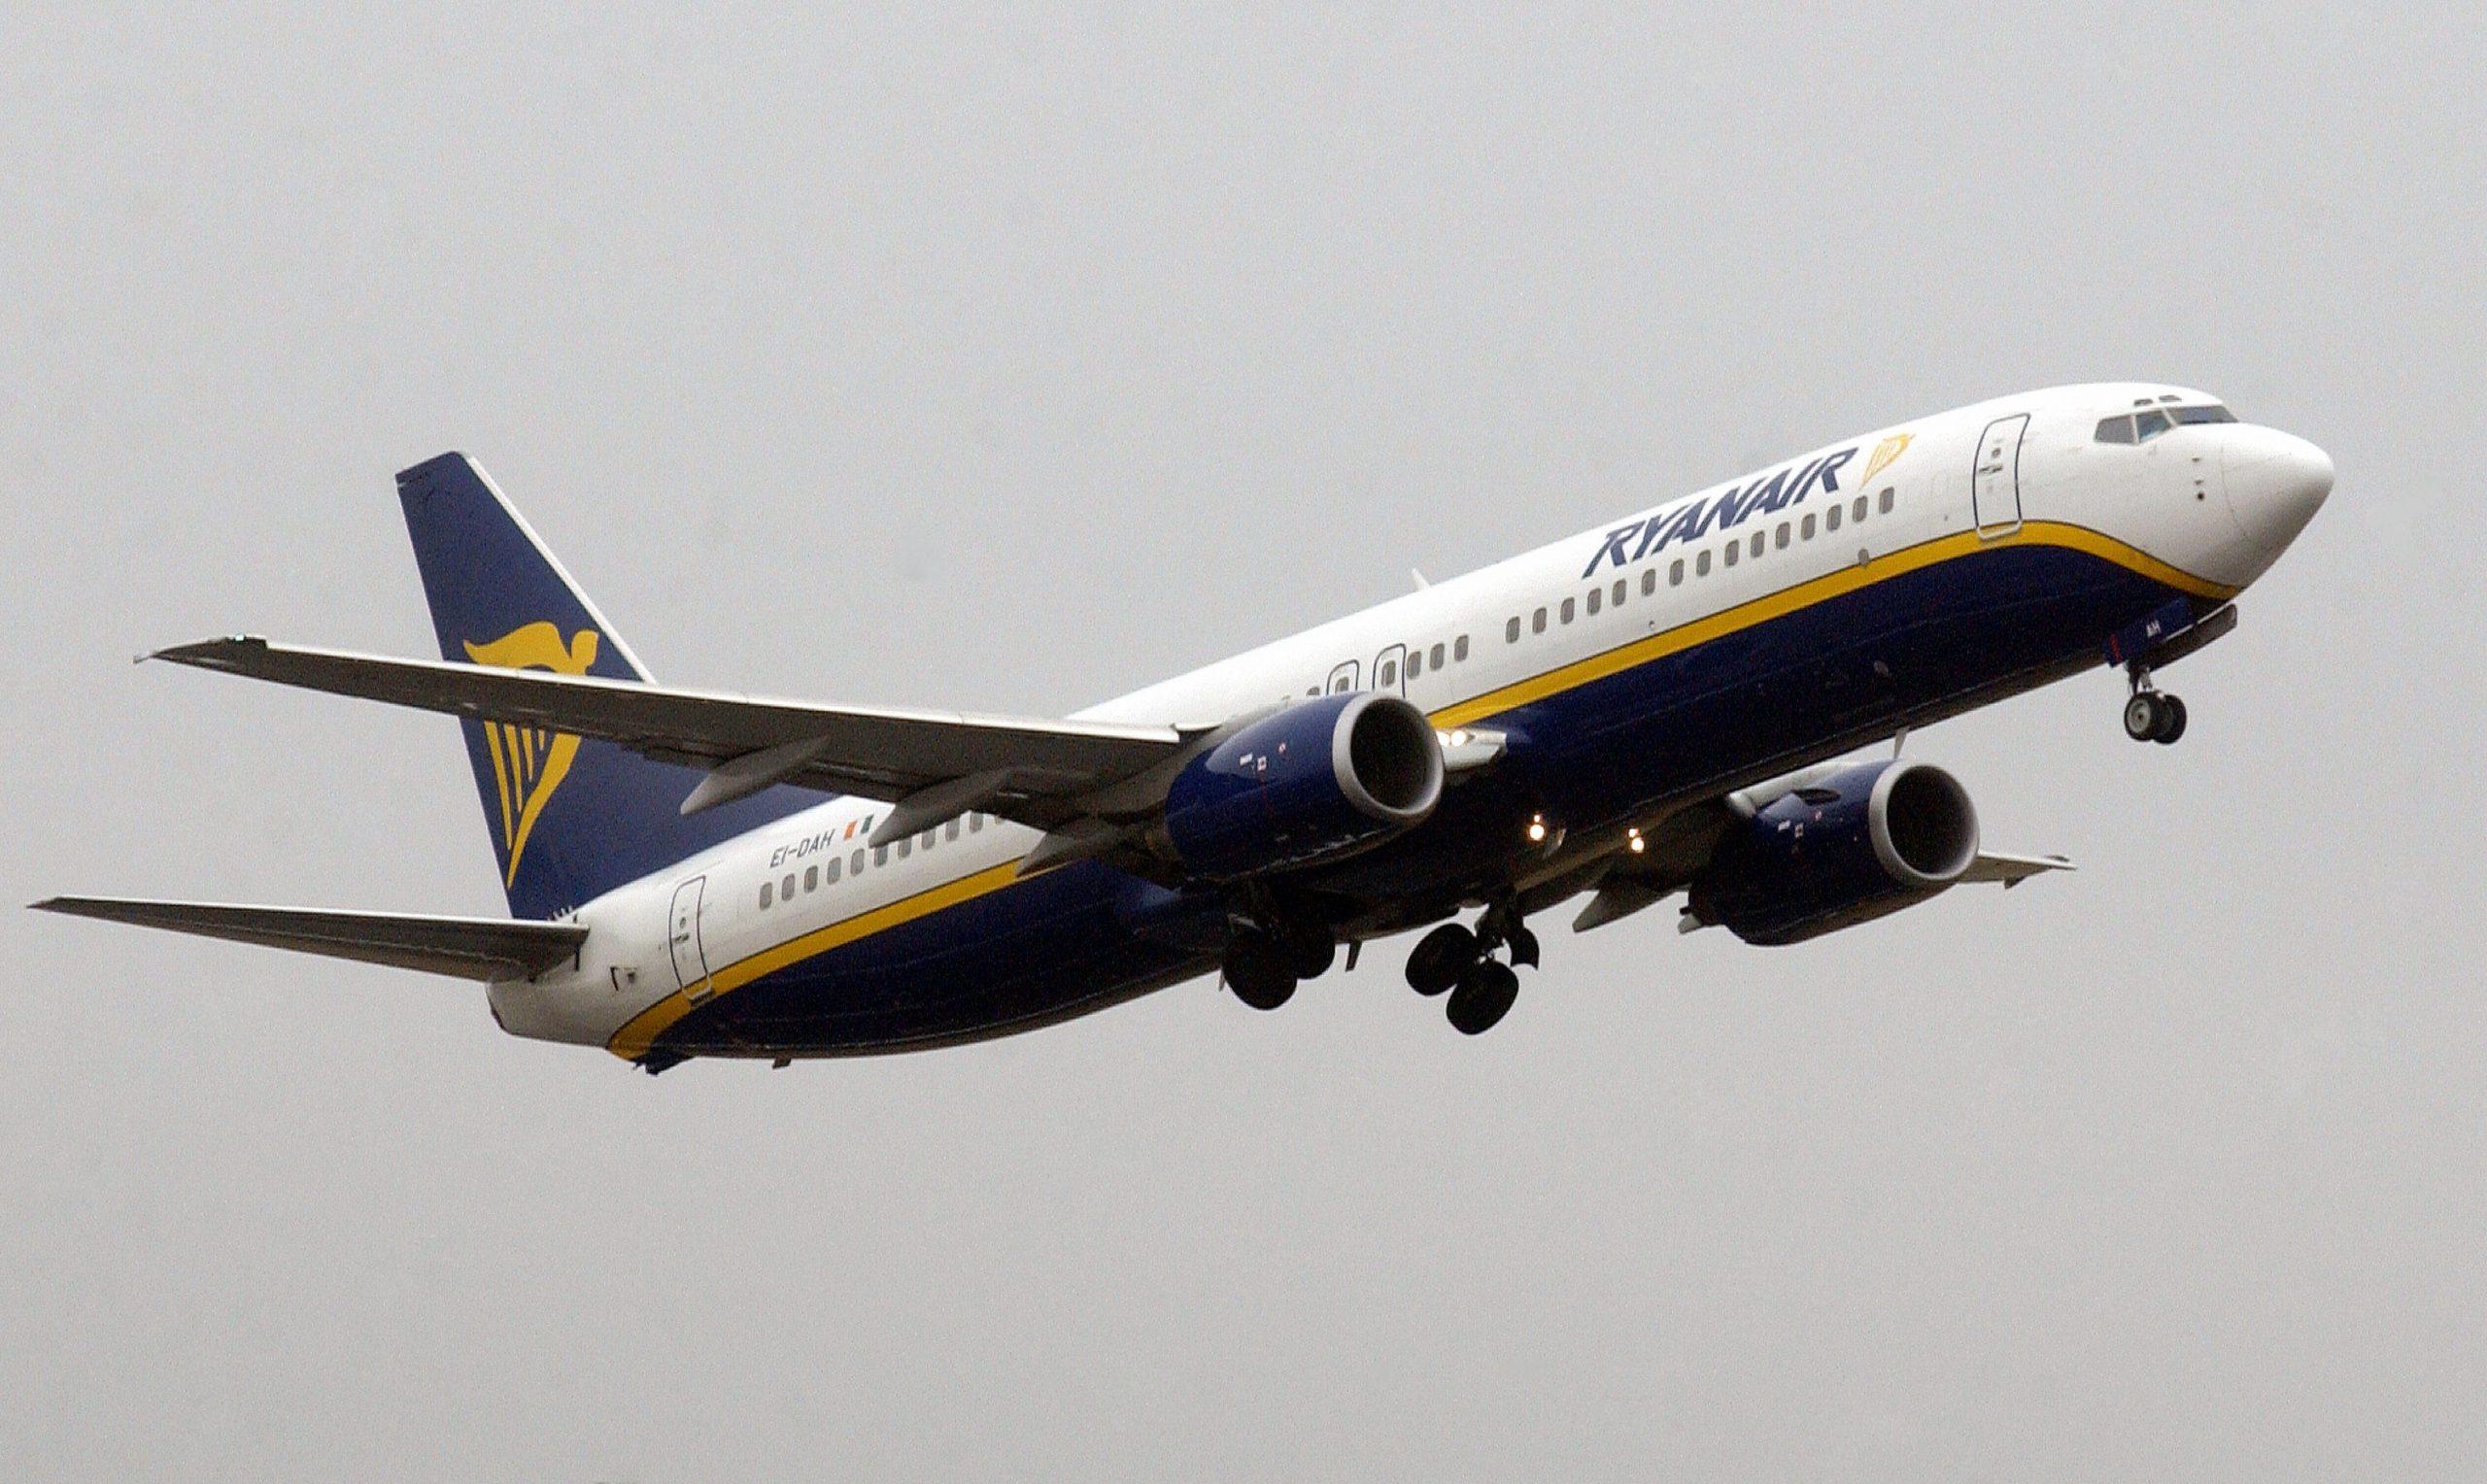 Minsk: Gegen Ryanair-Flugzeug lag Bombendrohung der Hamas vor